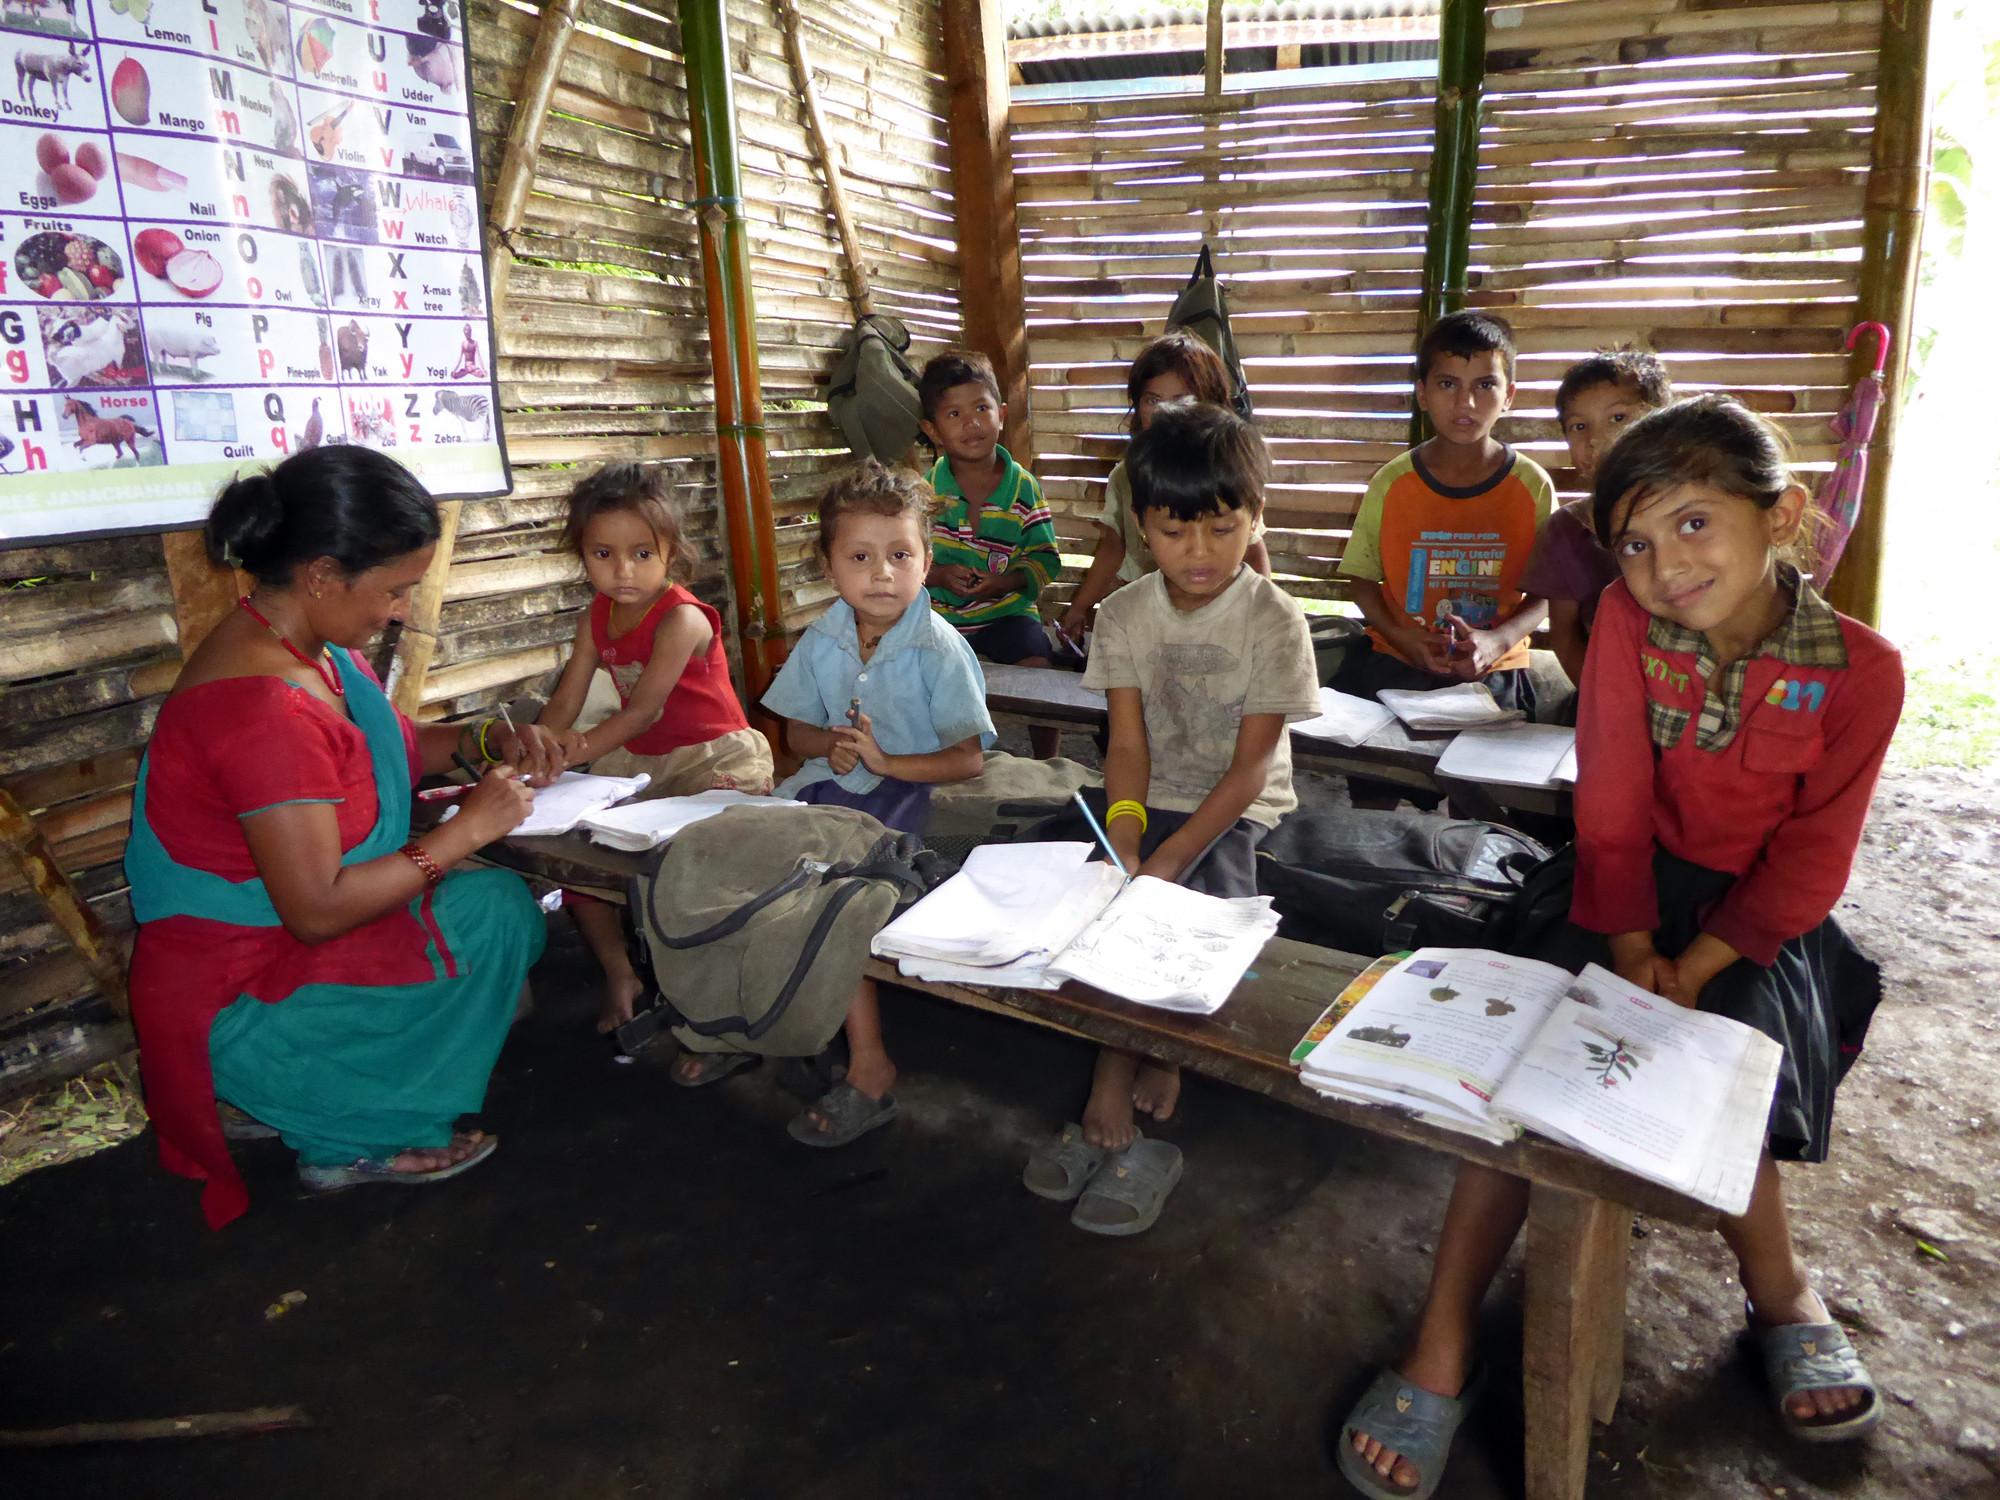 Earthquakes Lesson for Kids | Study.com